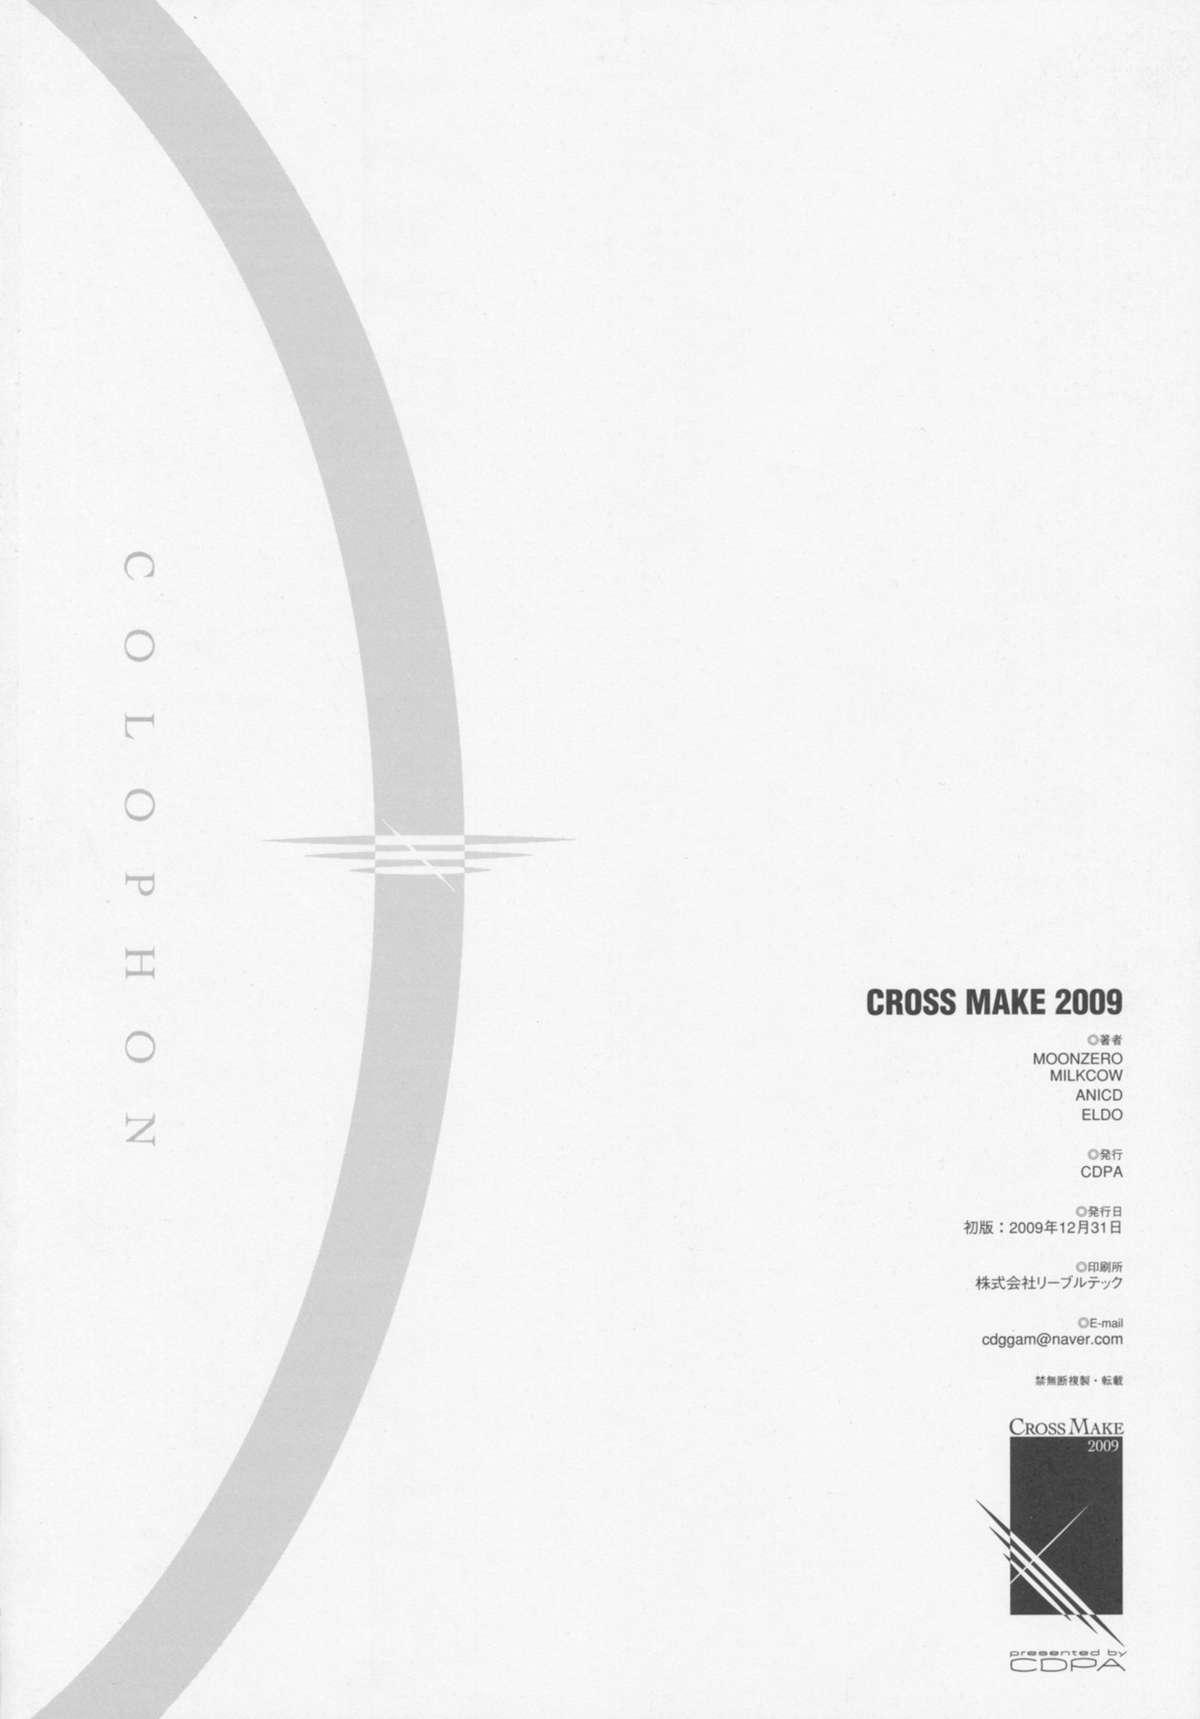 CROSS MAKE 2009 121